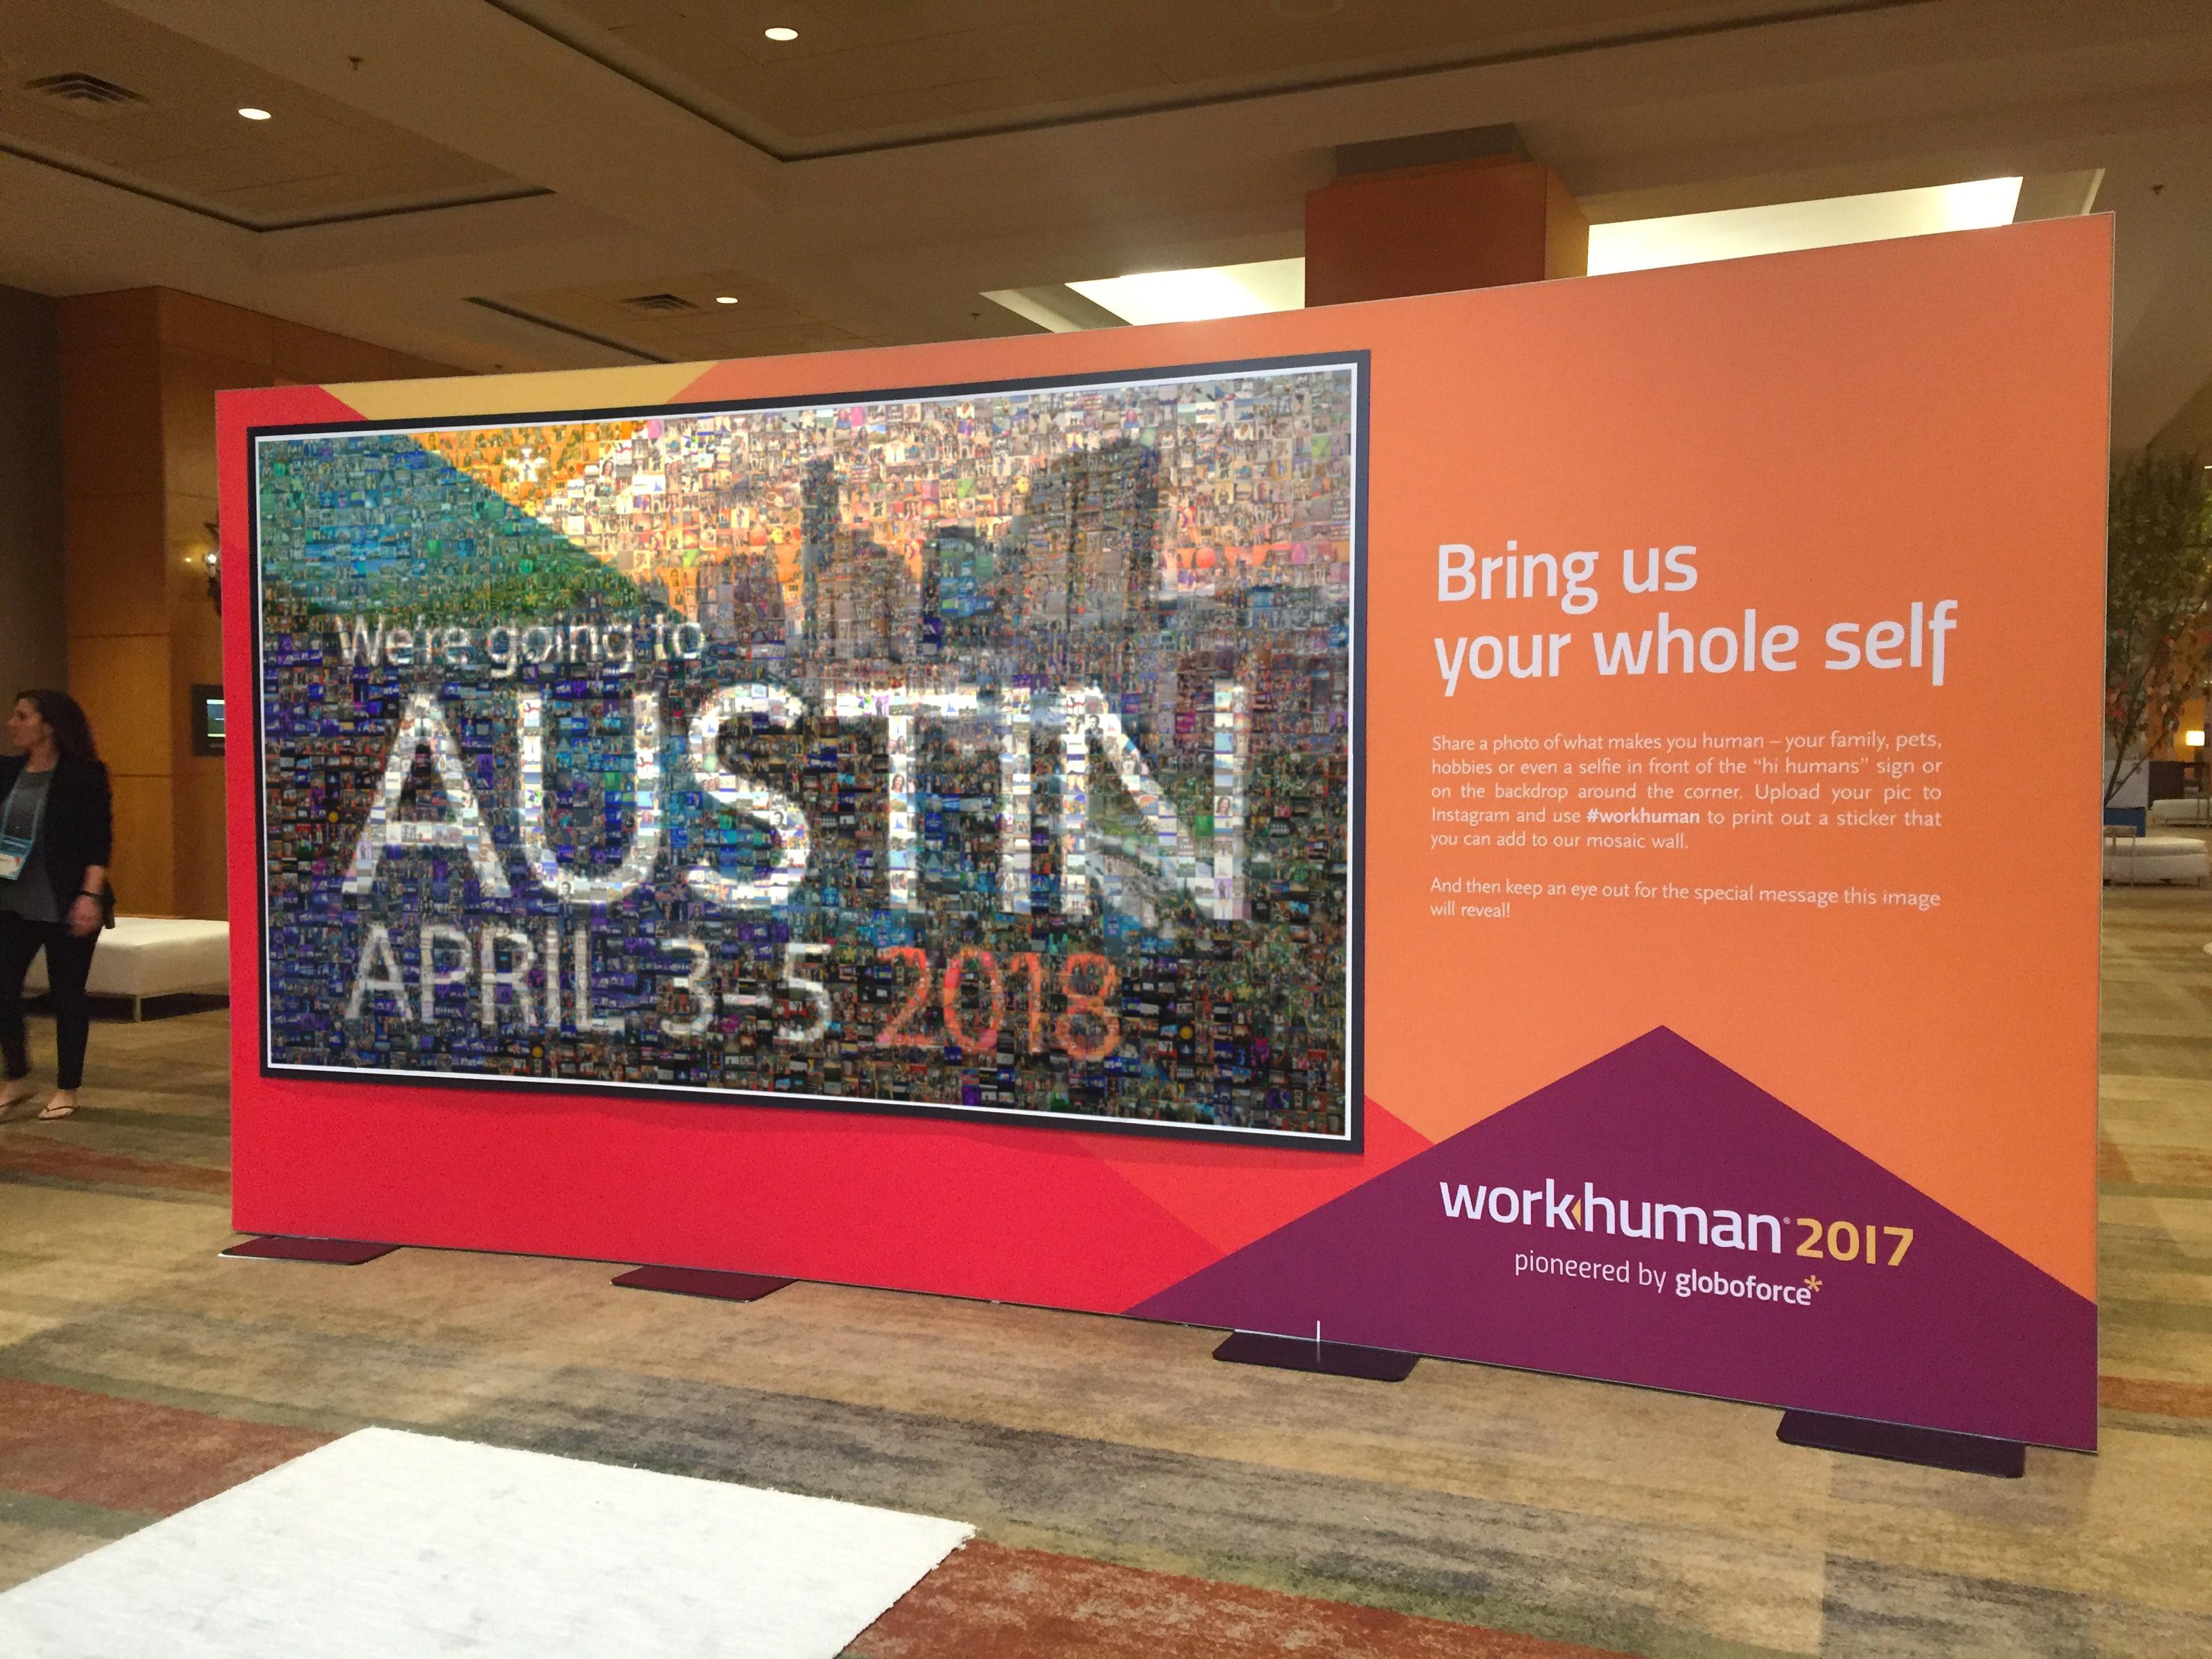 WorkHuman 2017 Live Print Mosaic Event